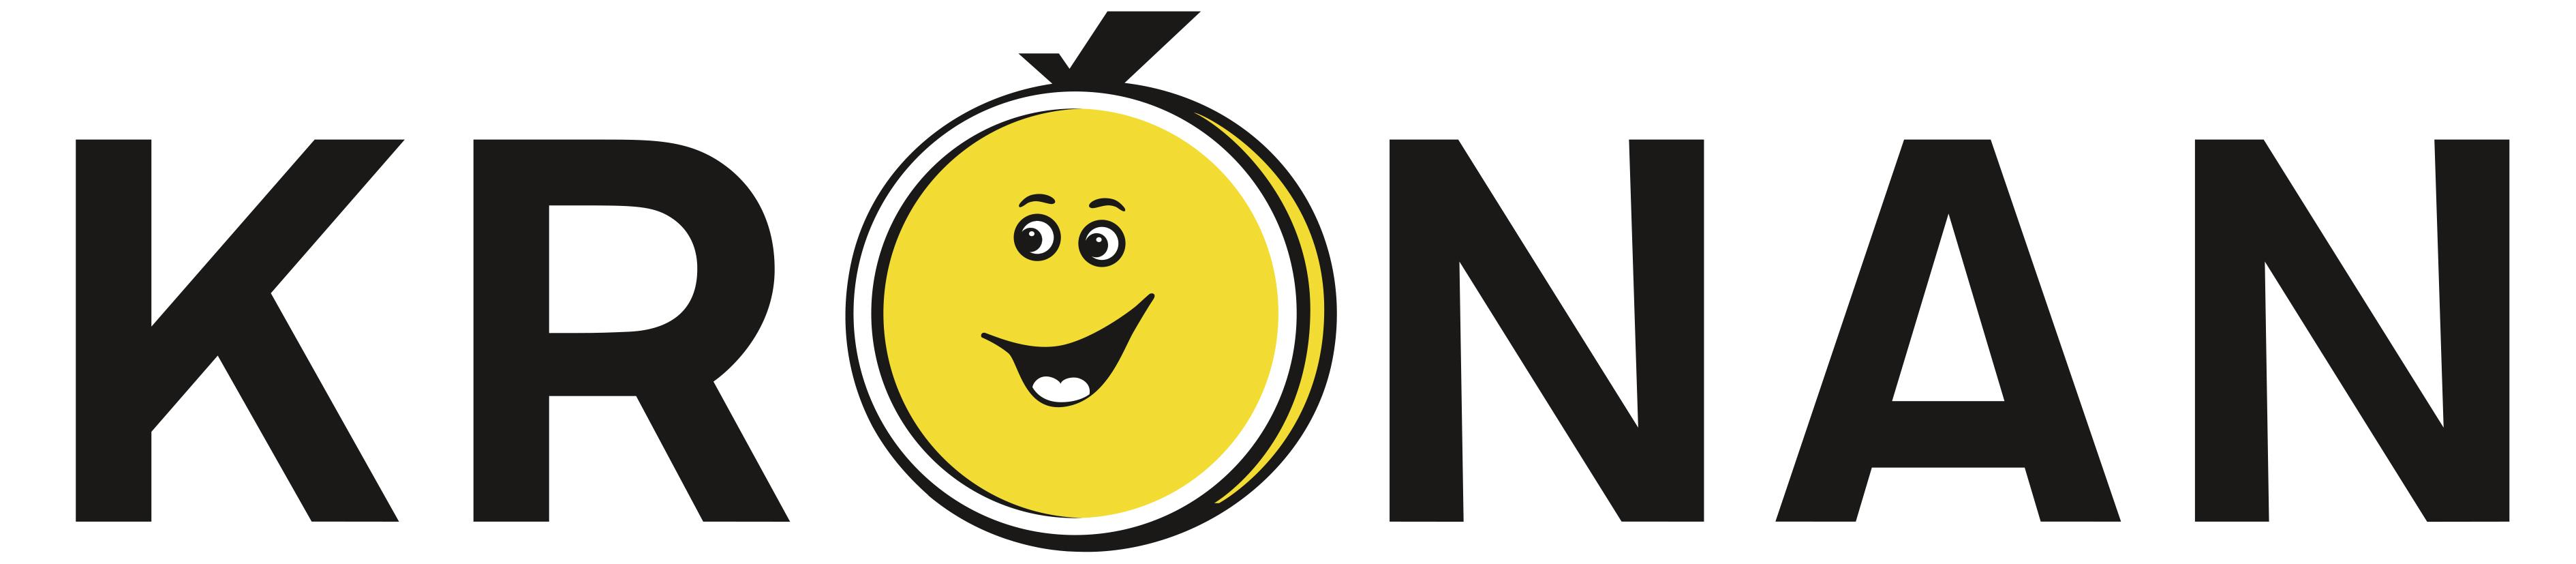 kronan-logo